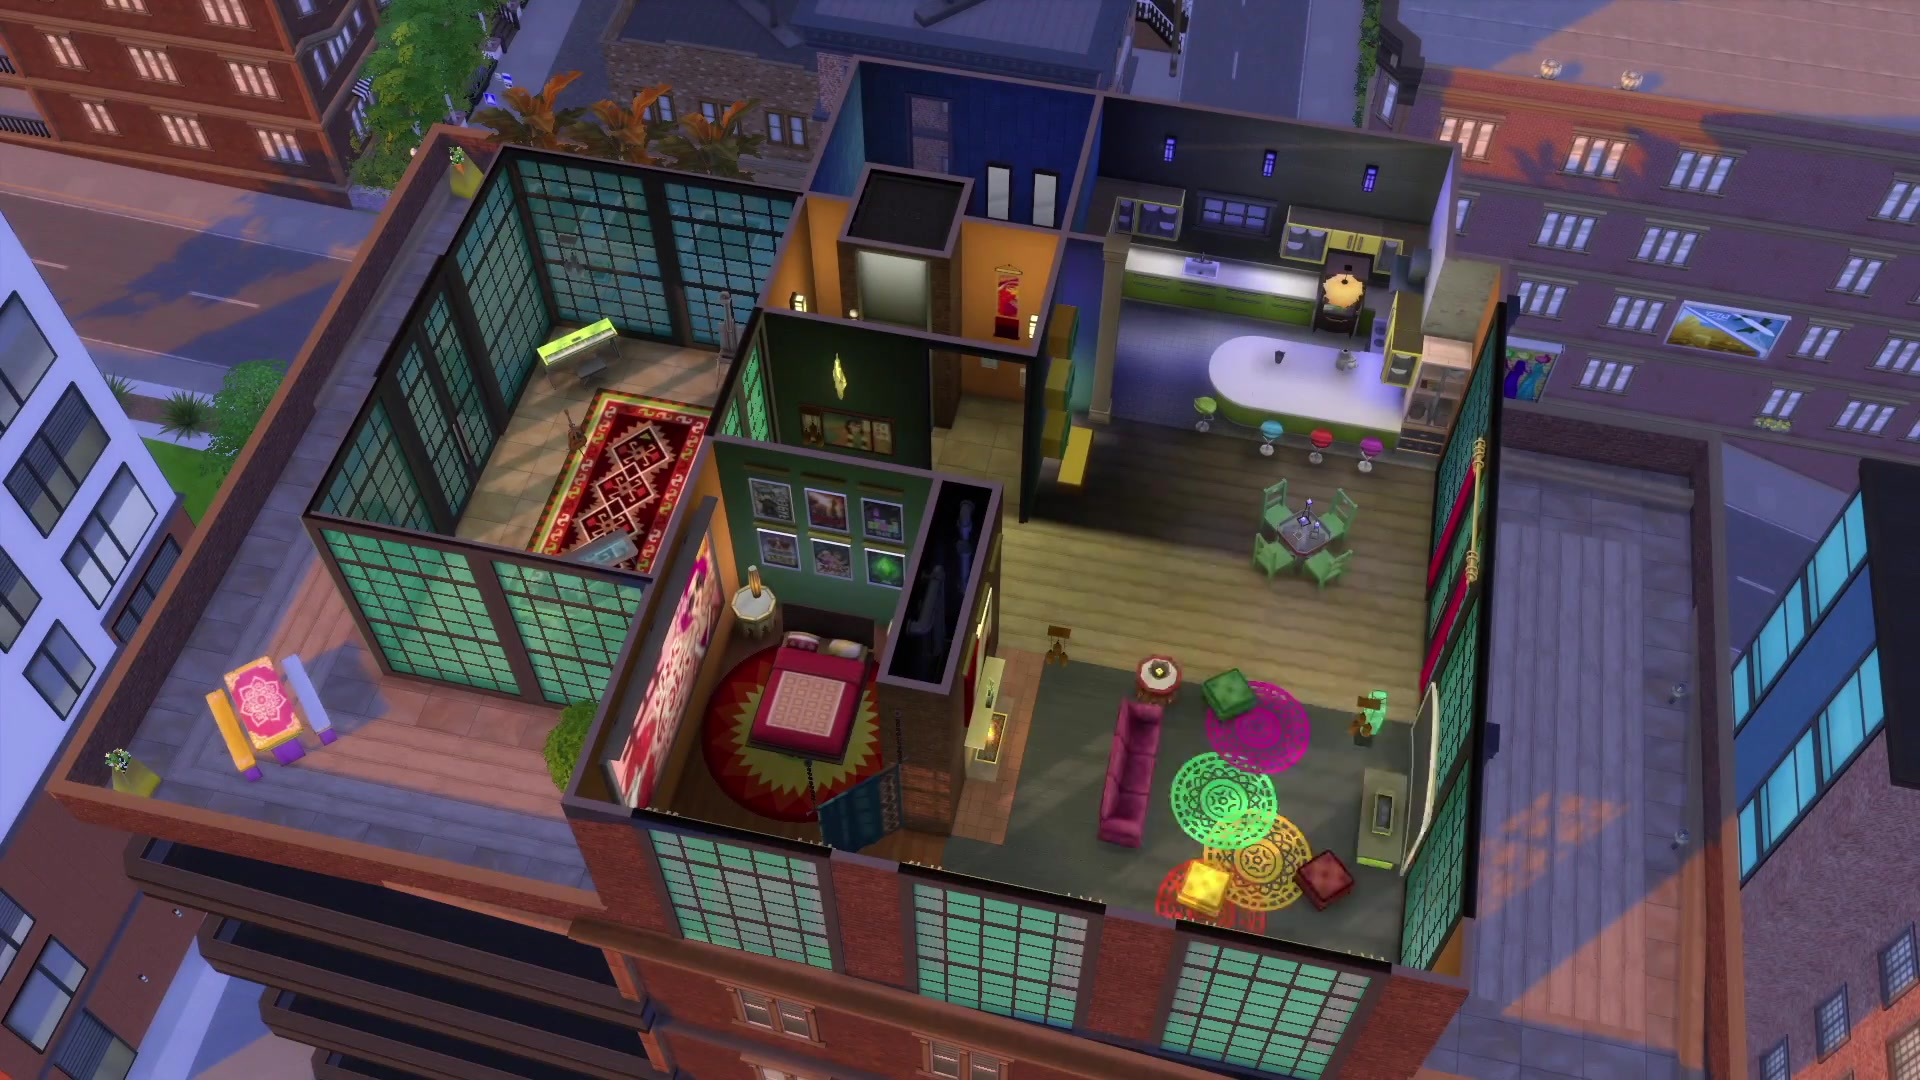 die sims 4 gro stadtleben als download online kaufen. Black Bedroom Furniture Sets. Home Design Ideas